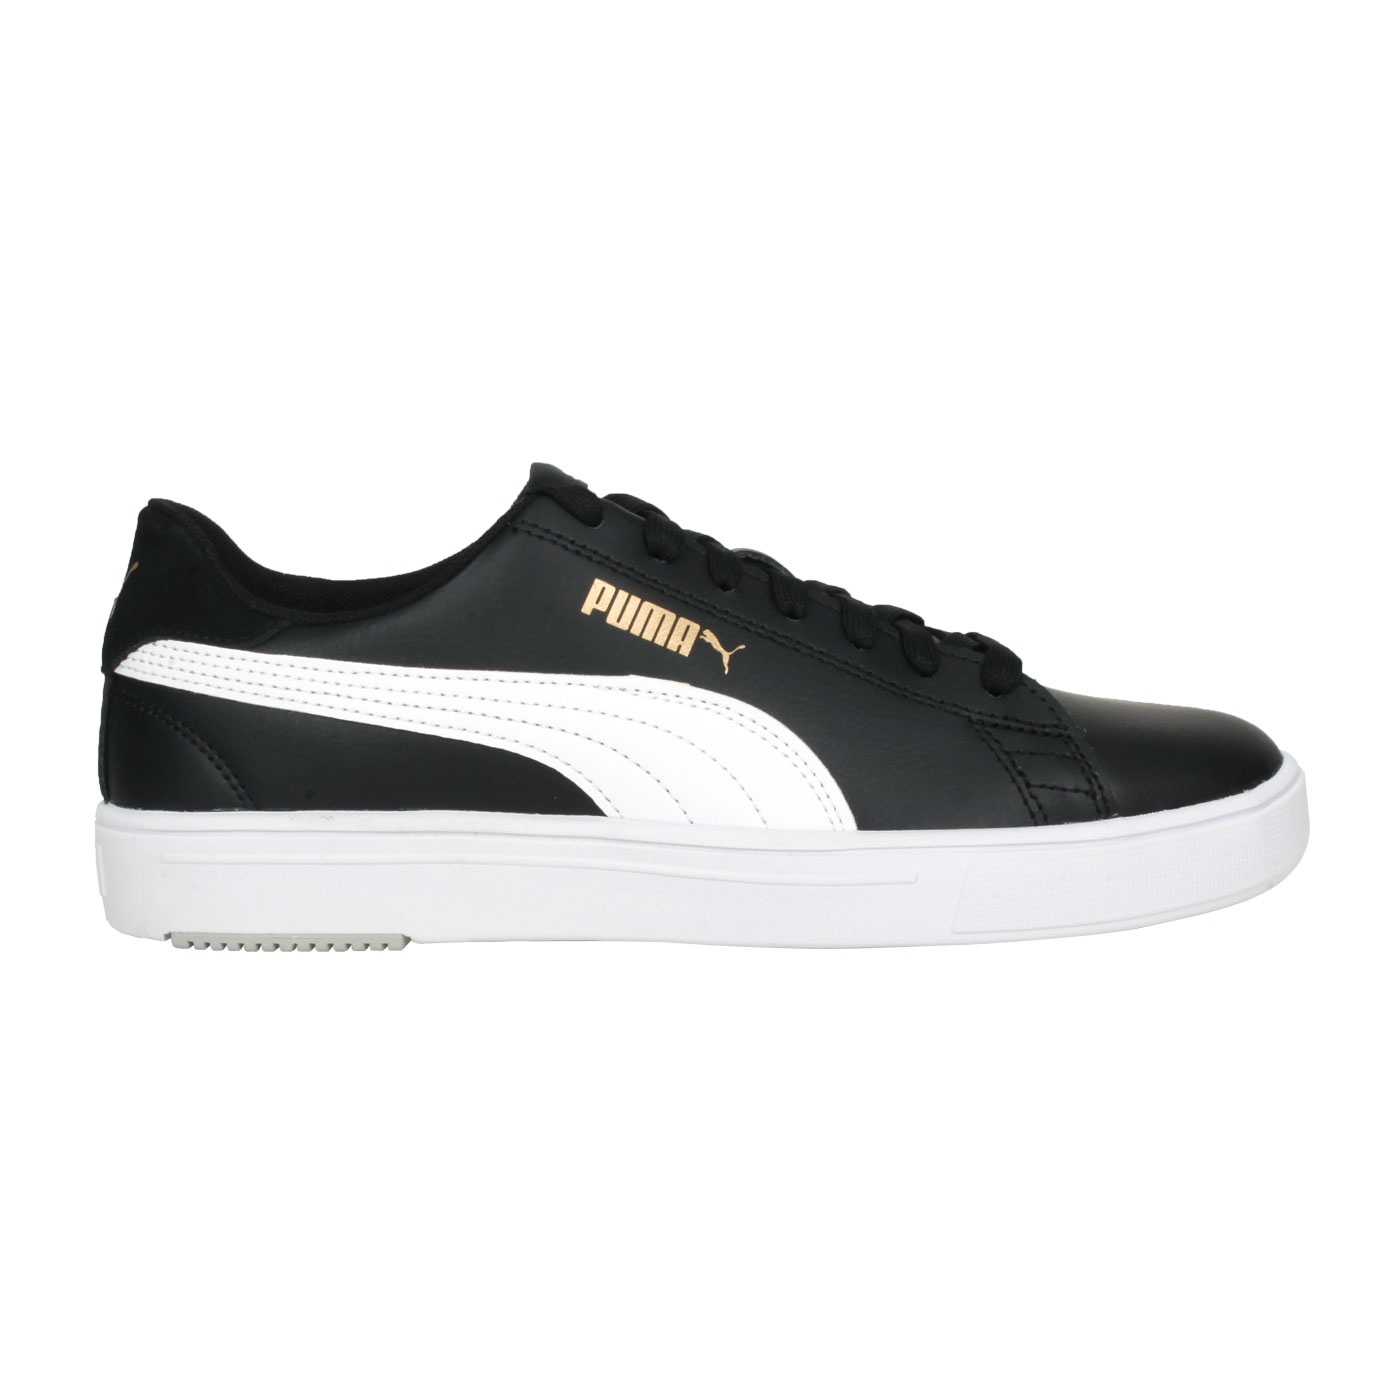 PUMA 男女休閒鞋  @Puma Serve Pro Lite@37490202